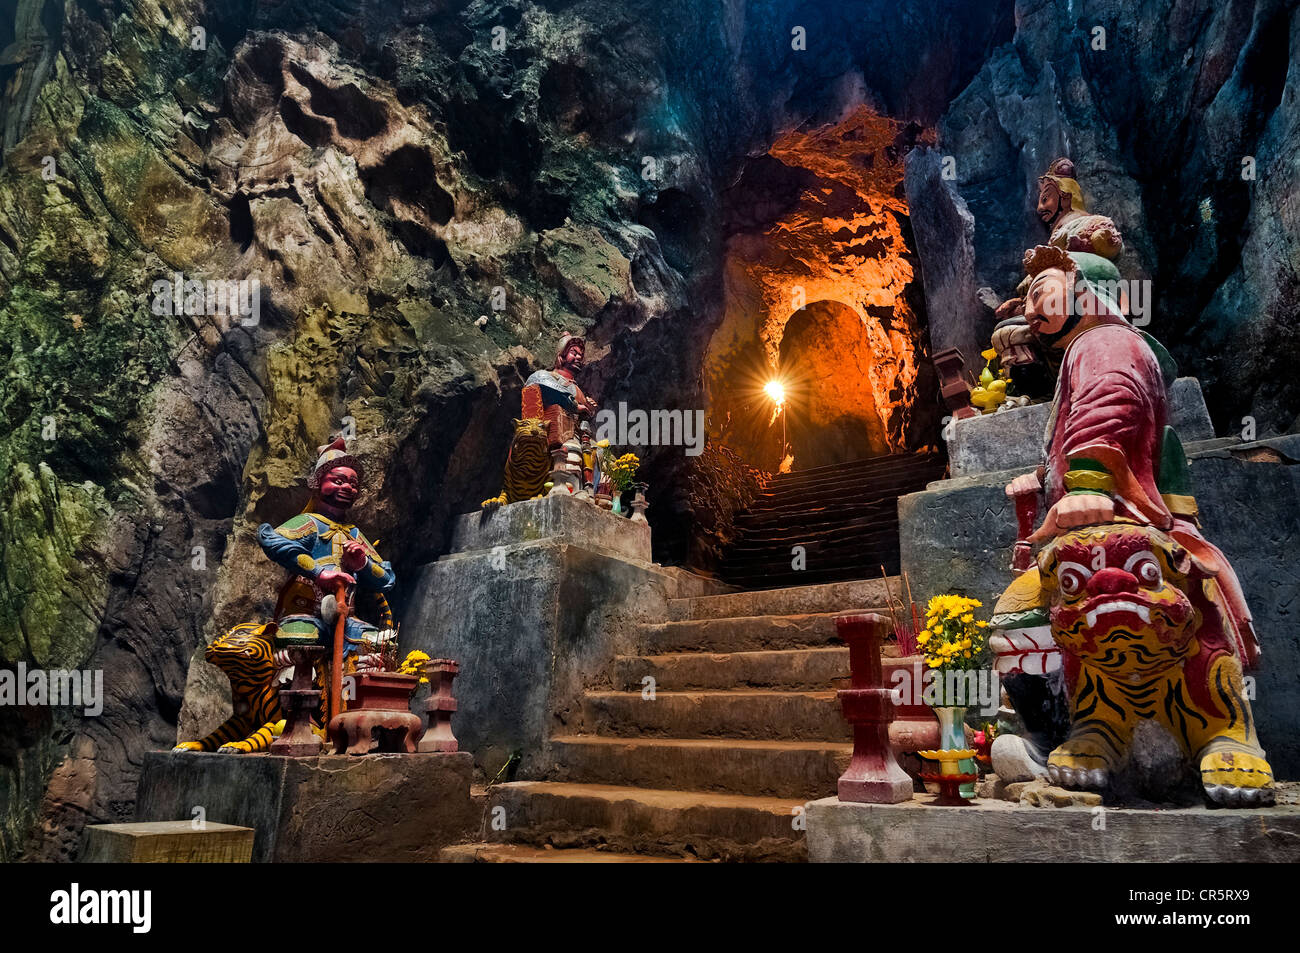 Entrance to Huyen Khong cave, protective deities, guardian figures, Marble Mountains, Ngu Hanh Son, Thuy Son, Da - Stock Image